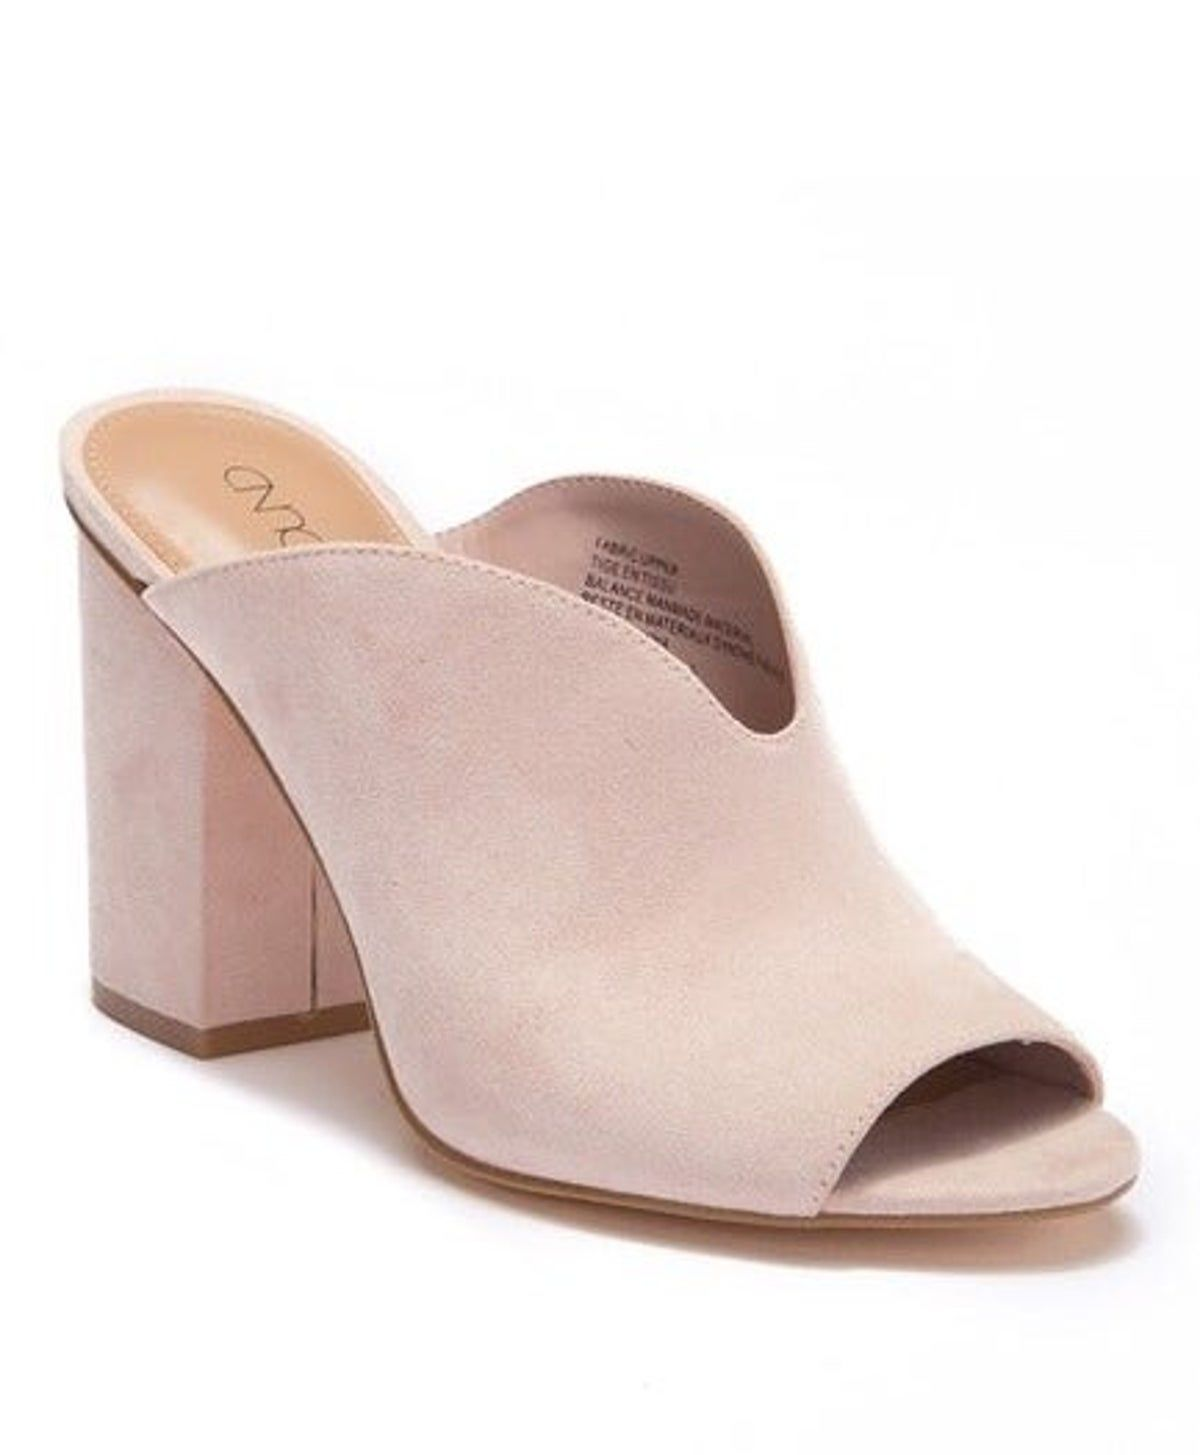 Fashion Women Slip On Sandals High Heel Platform Block Shoes Peep Toe Mules Size